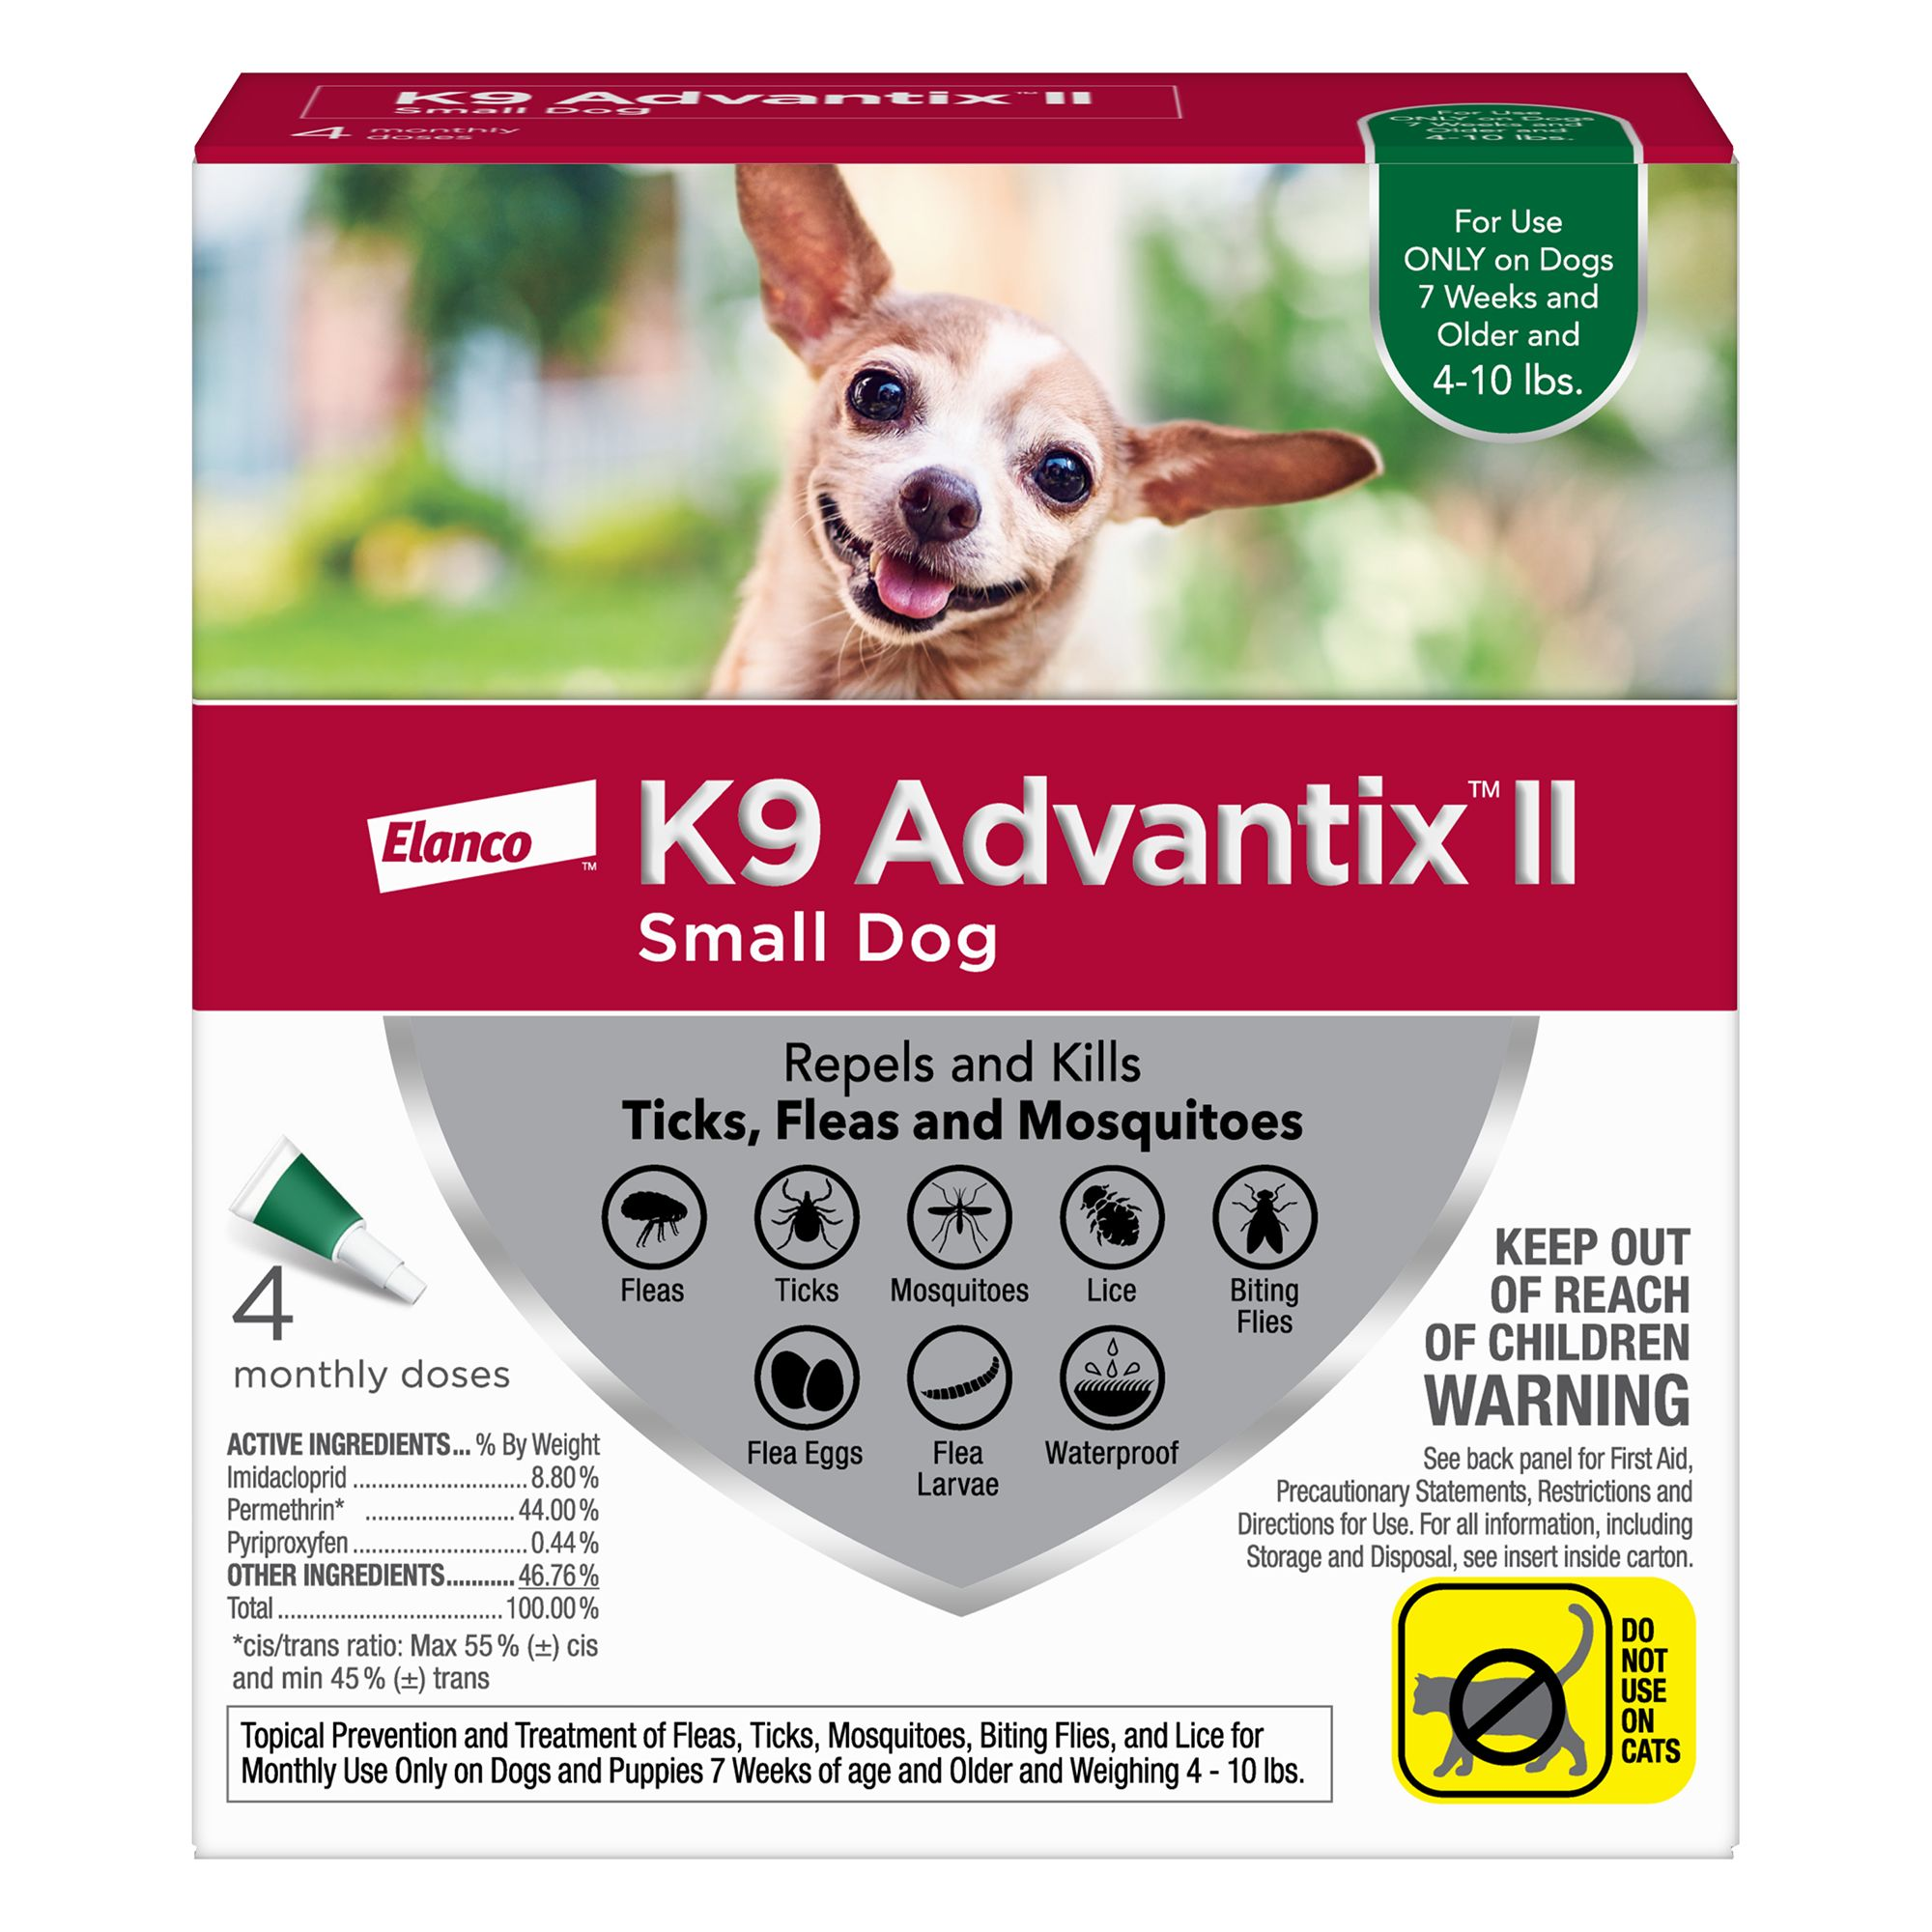 K9 Advantix Ii Under 10 Lbs Dog Flea And Tick Treatment Size 4 Count